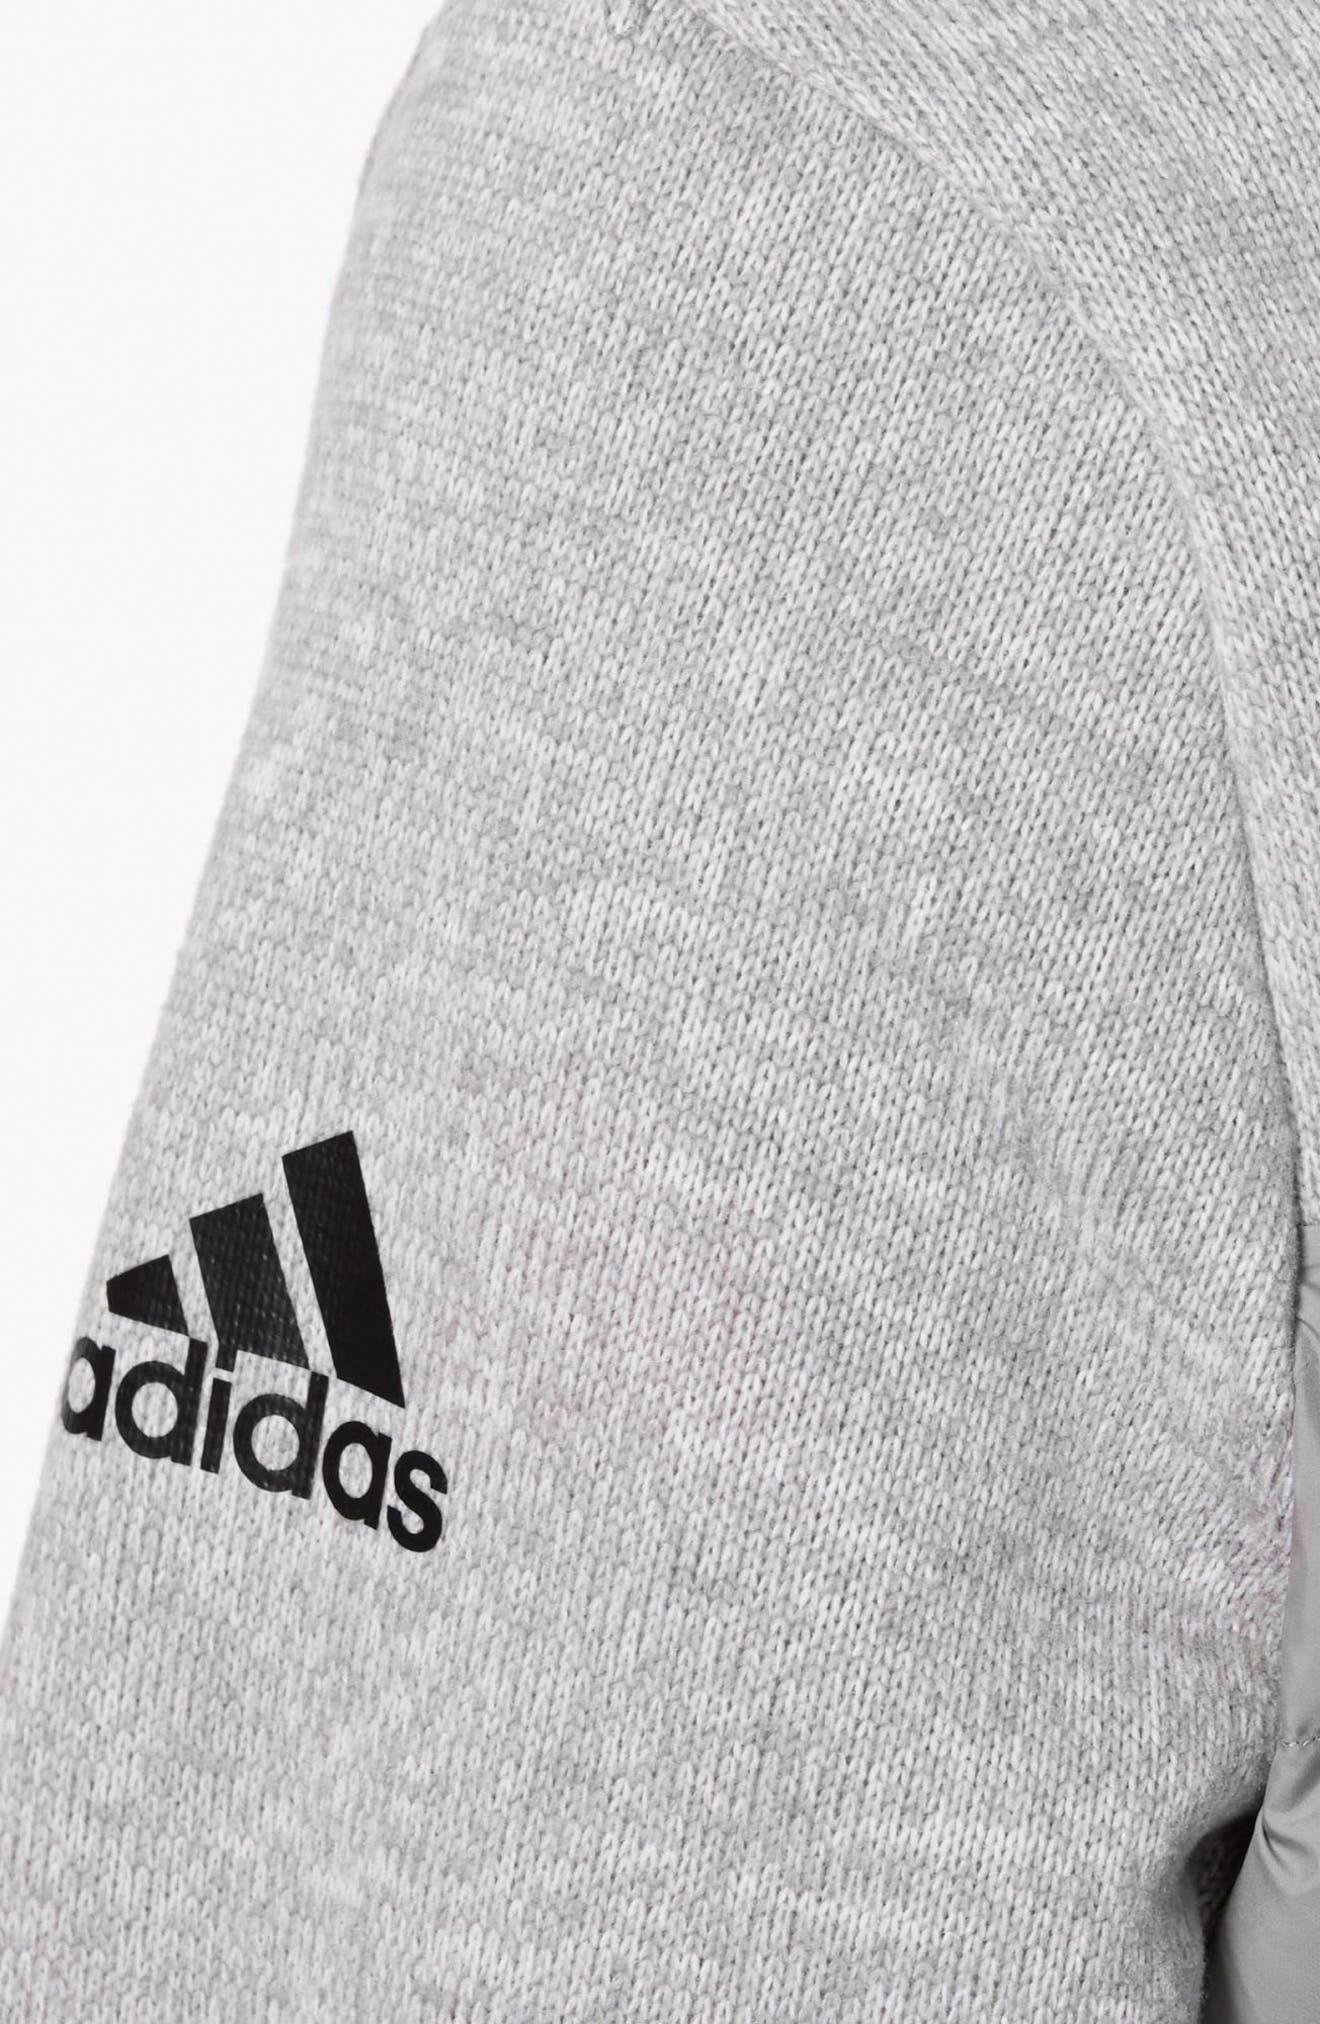 Nuvic Hybrid 2 Fleece/Puffer Jacket,                             Alternate thumbnail 6, color,                             Medium Grey Heather/Solid Grey